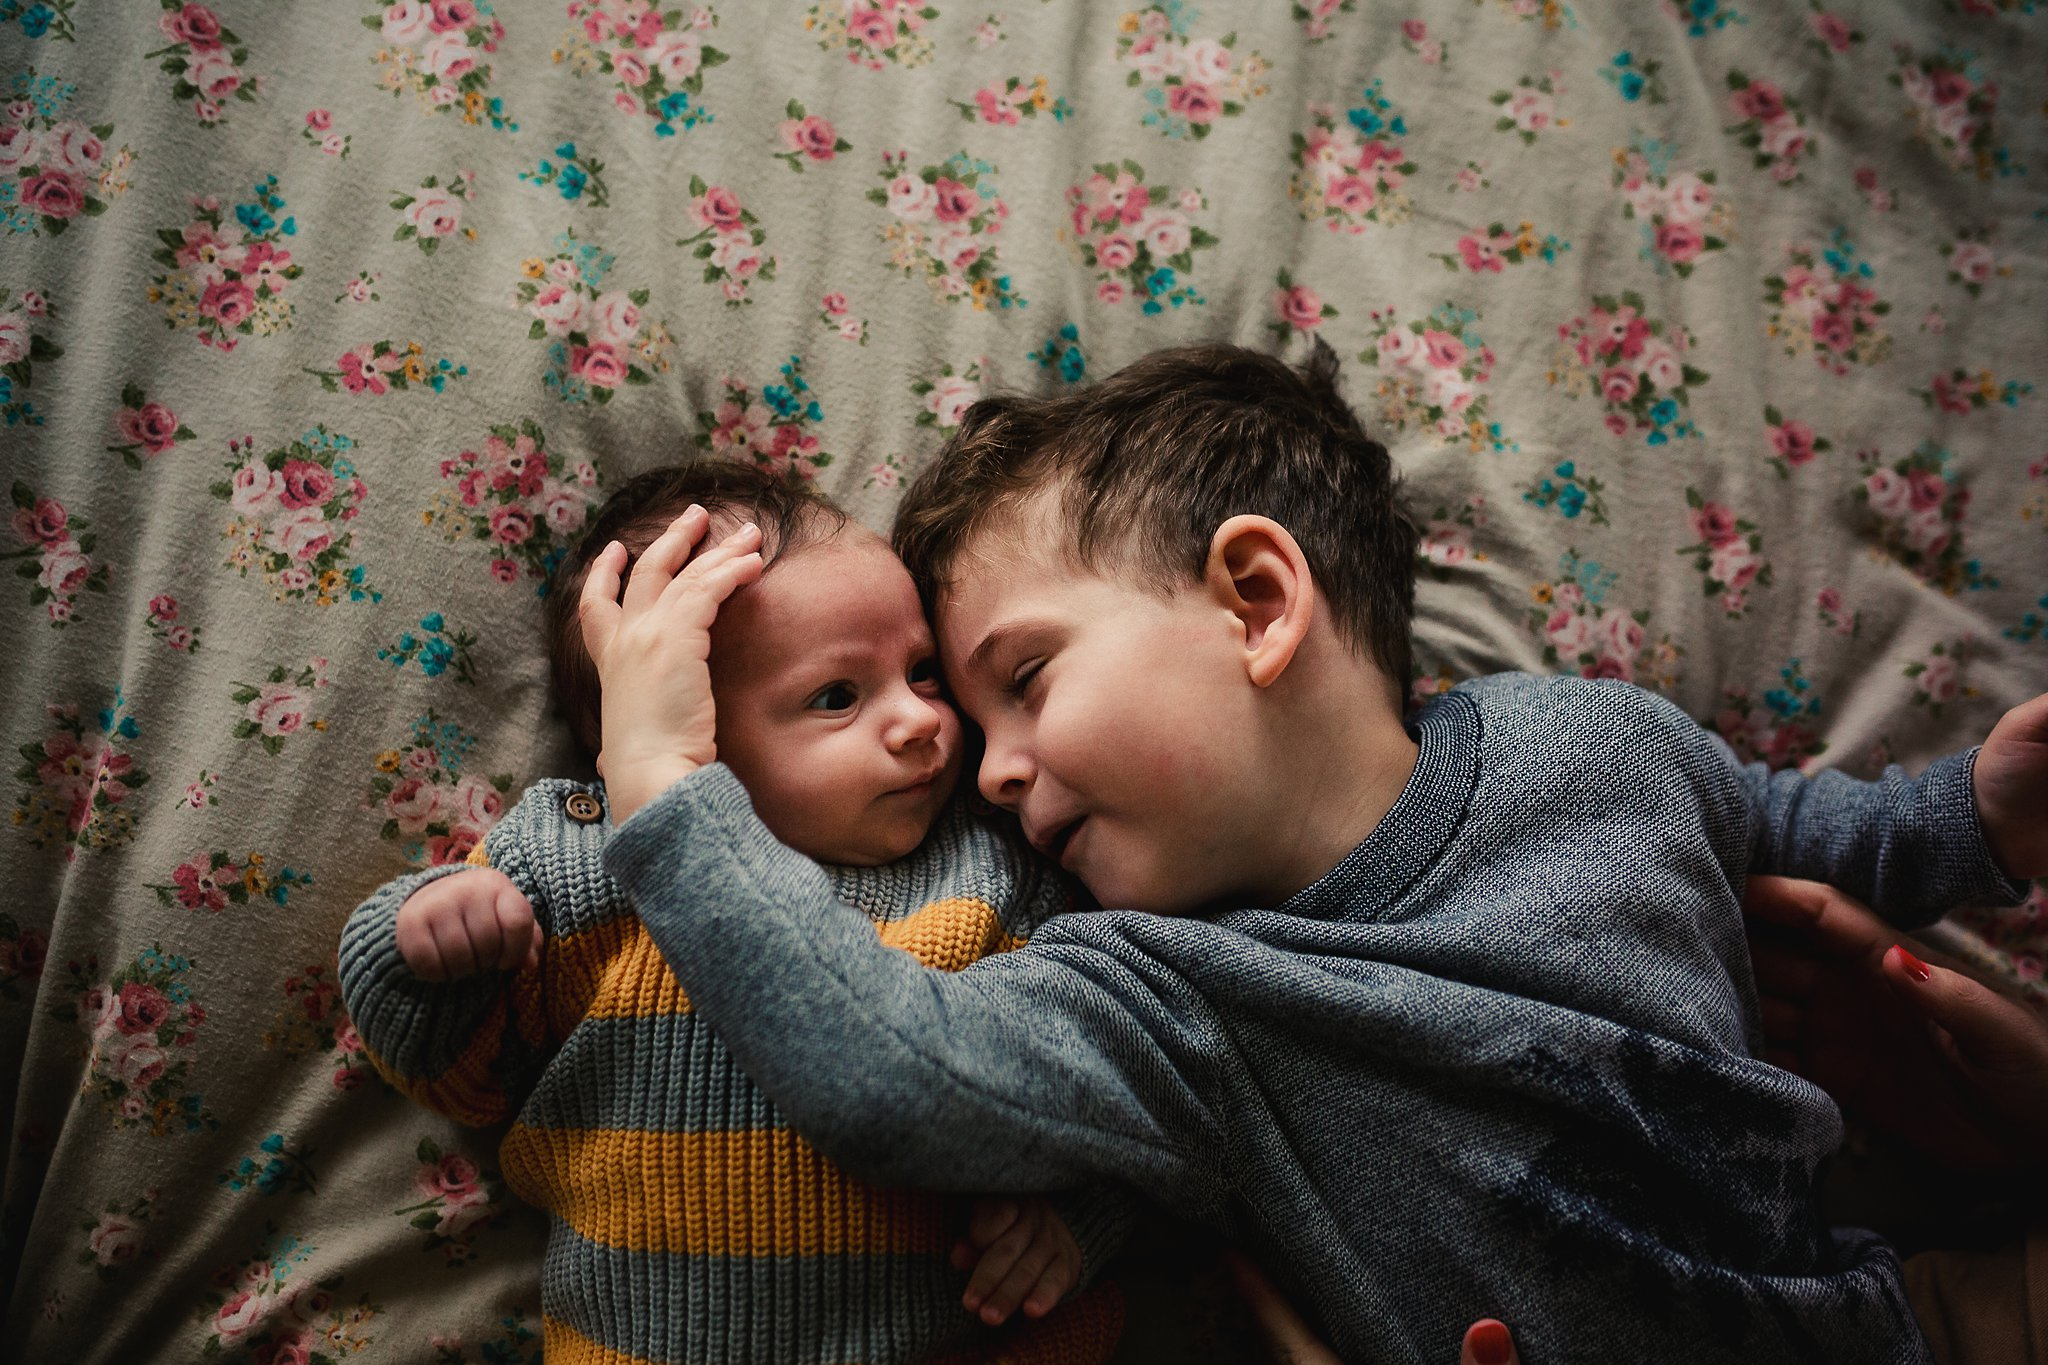 newborn-baby-in-home-family-photography-albury-wodonga-north-east-victoria (9).jpg